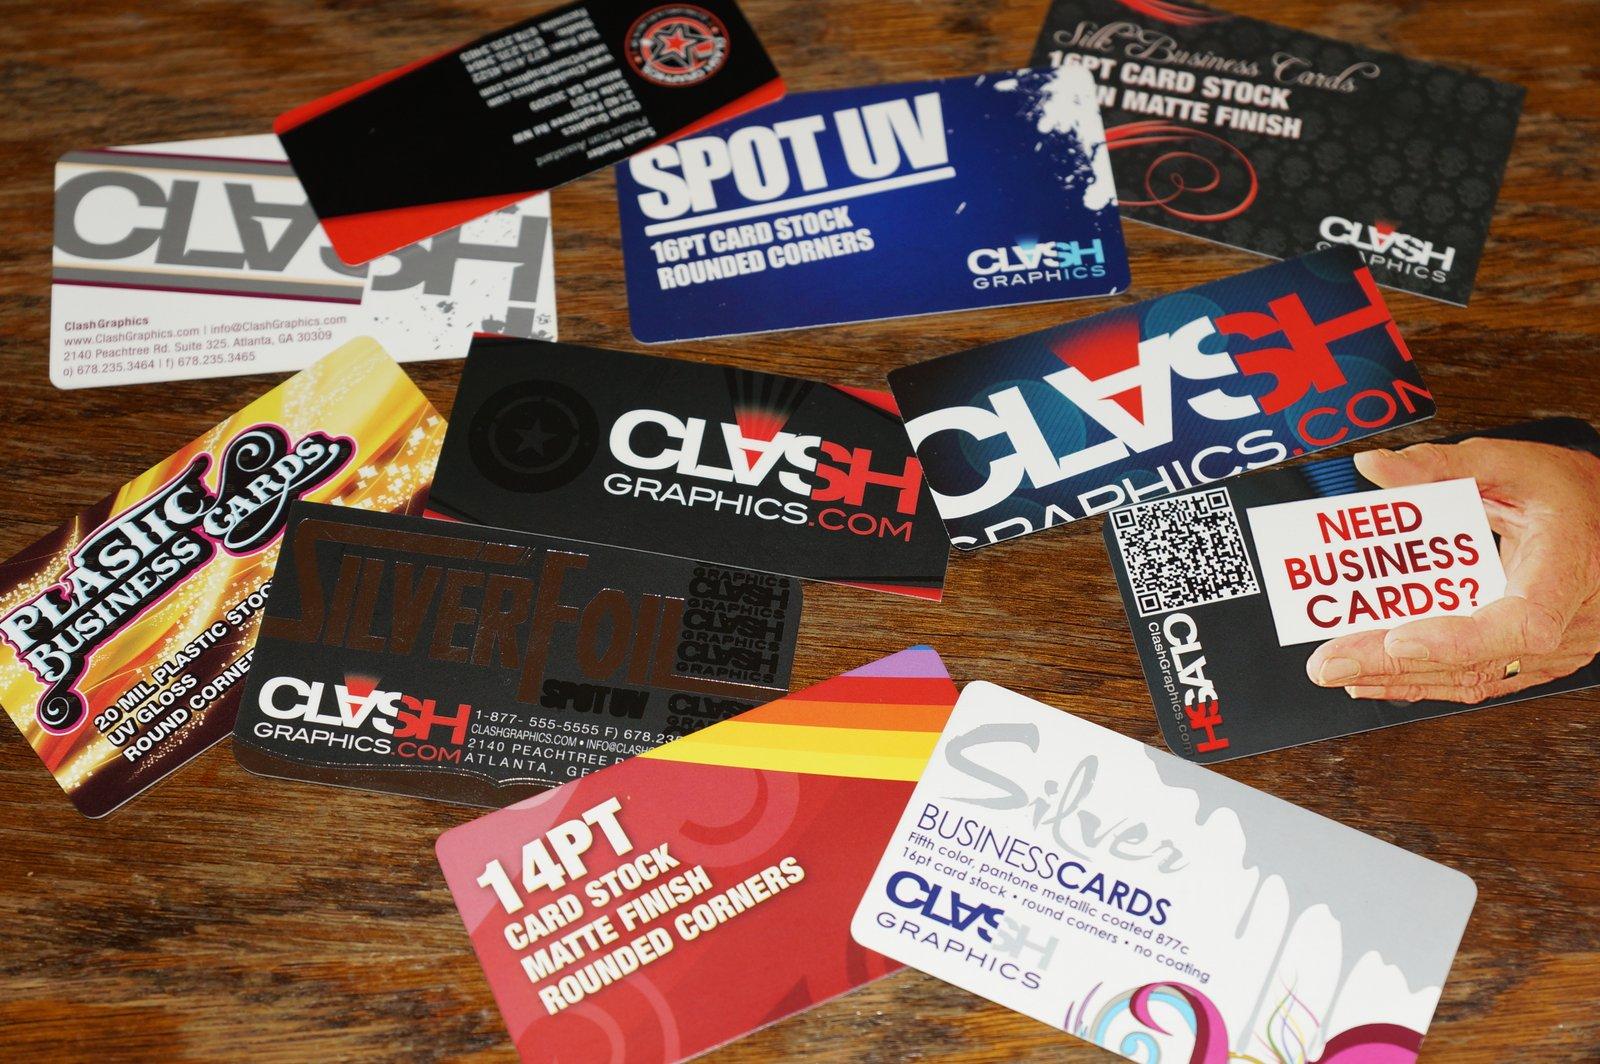 Clash Graphics Print Shop Atlanta Flyer Printing